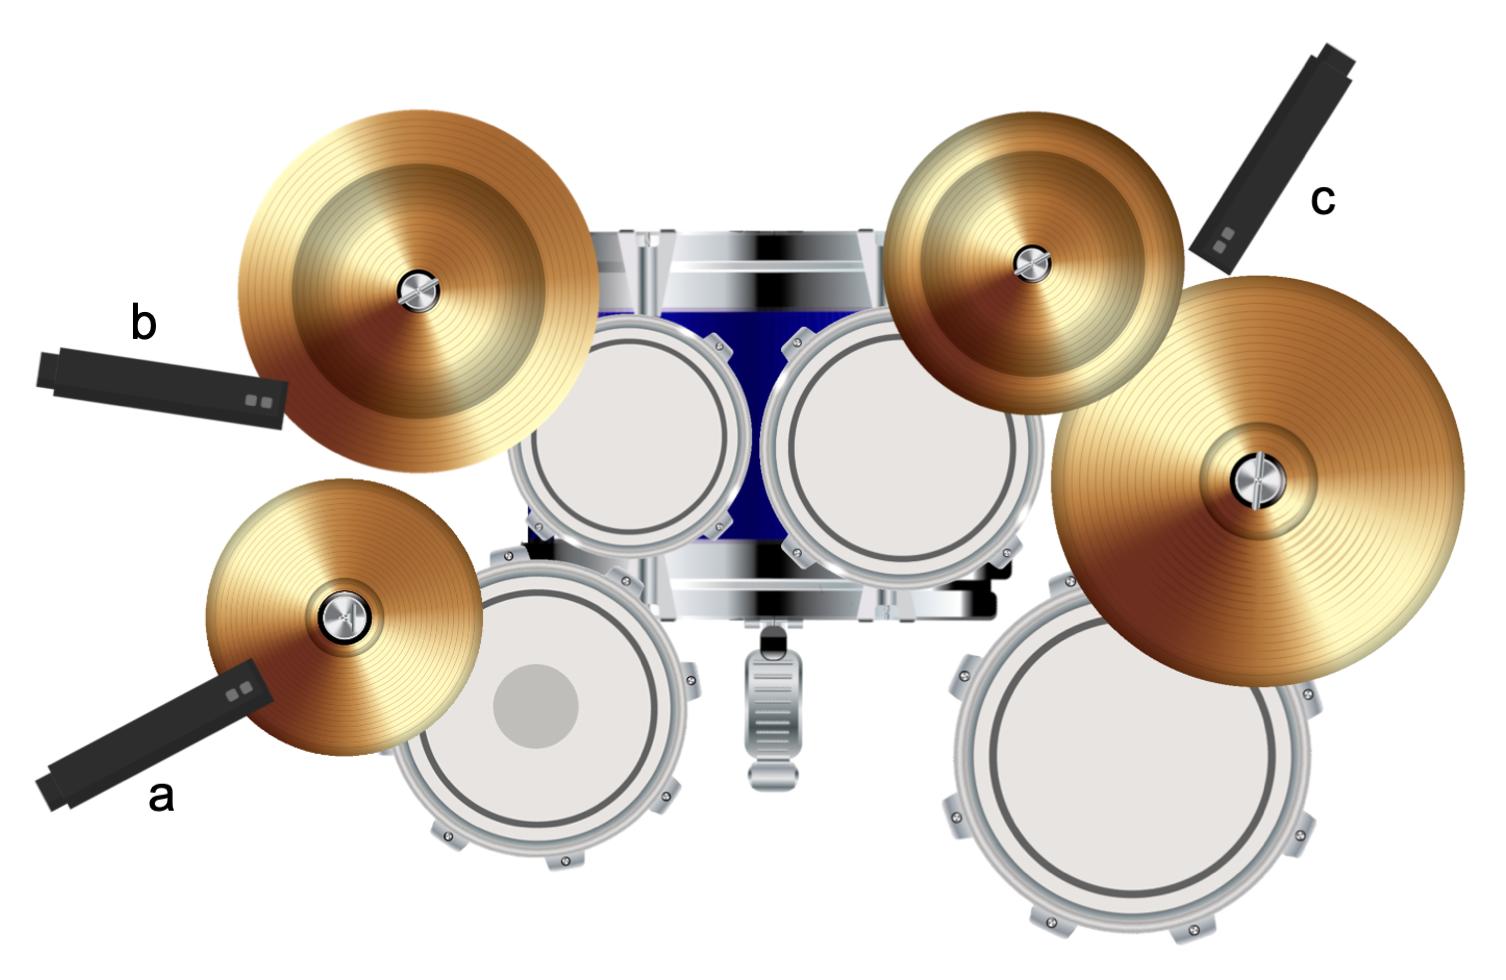 Figure 15.12. Close microphones positioned to capture cymbals: (a) hi-hat; (b) crash; (c) ride and crash